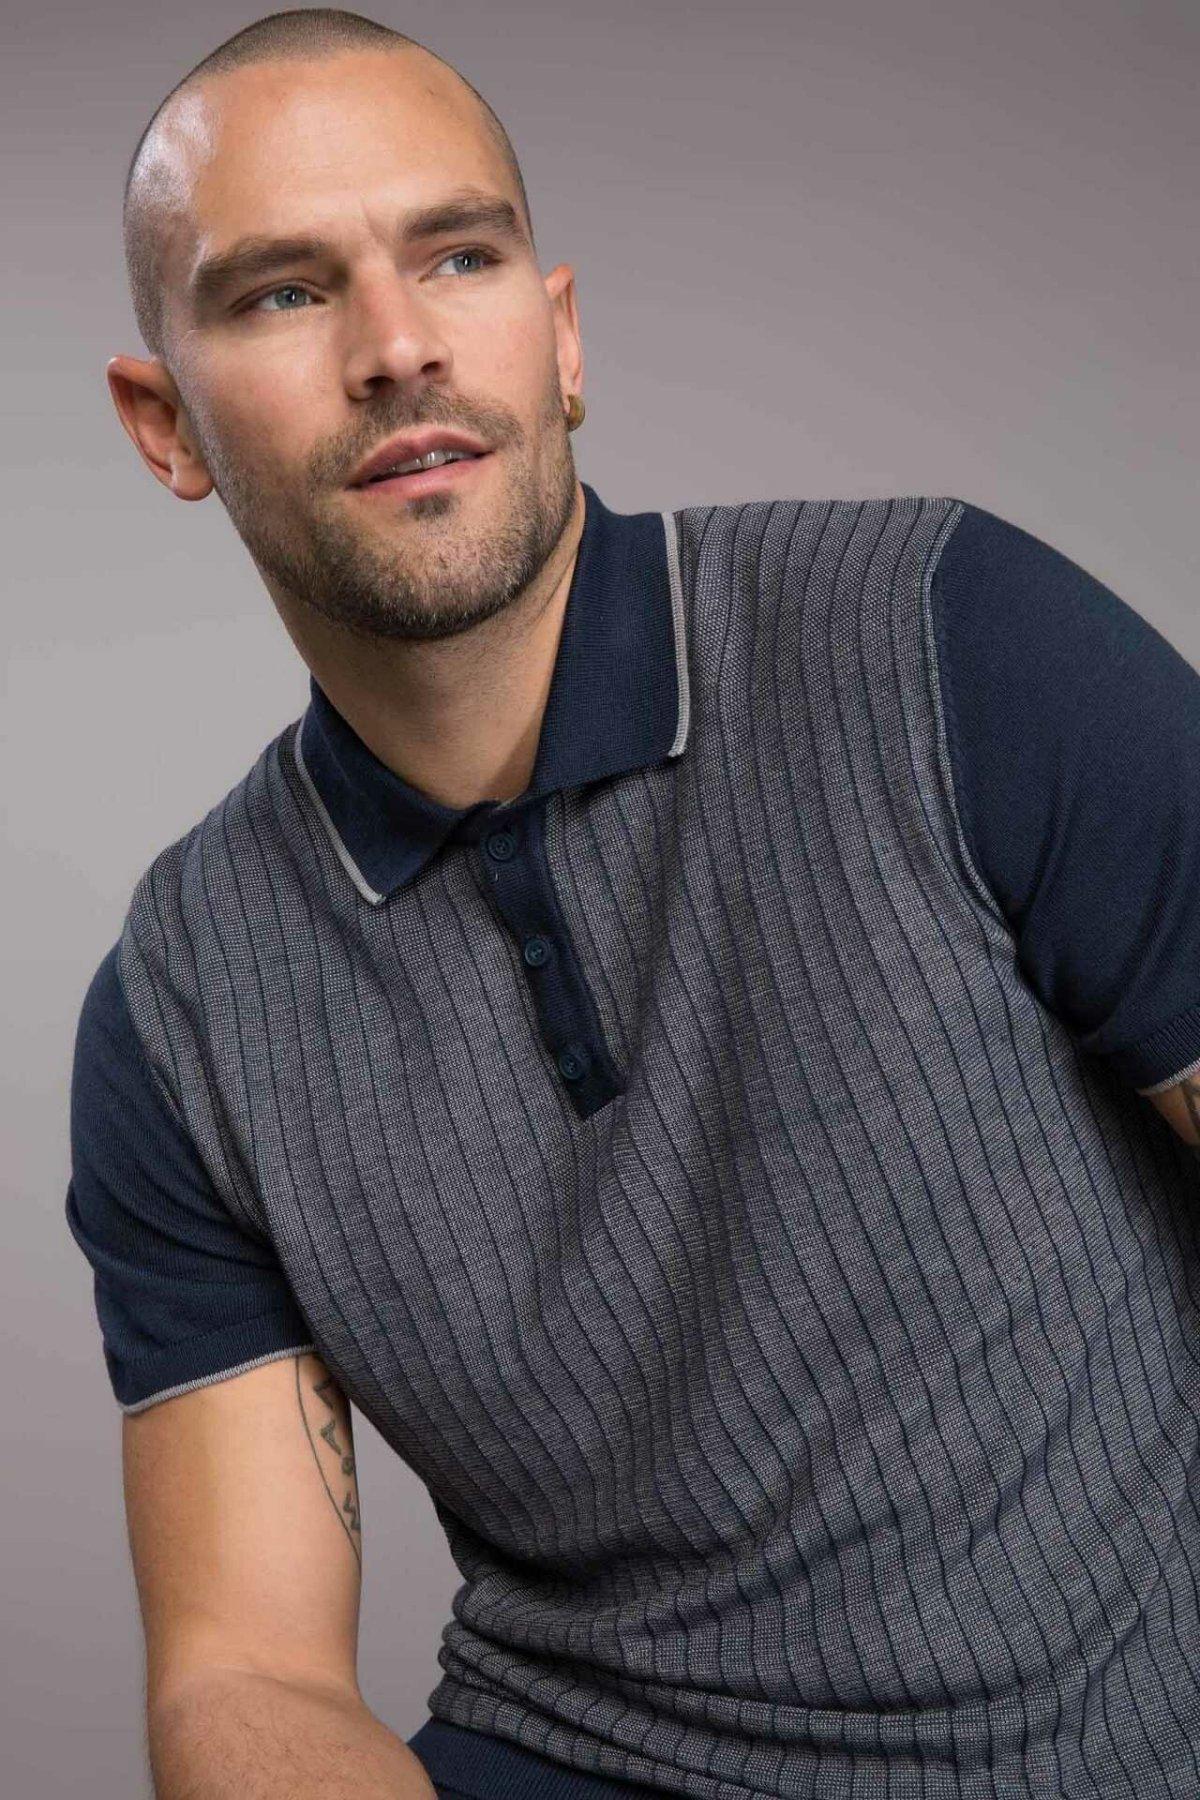 DeFacto Slim Fit Smart Casual Polo Men Summer Top Tees Dark Color Short Sleeve Male Shirt-I3645AZ18SP